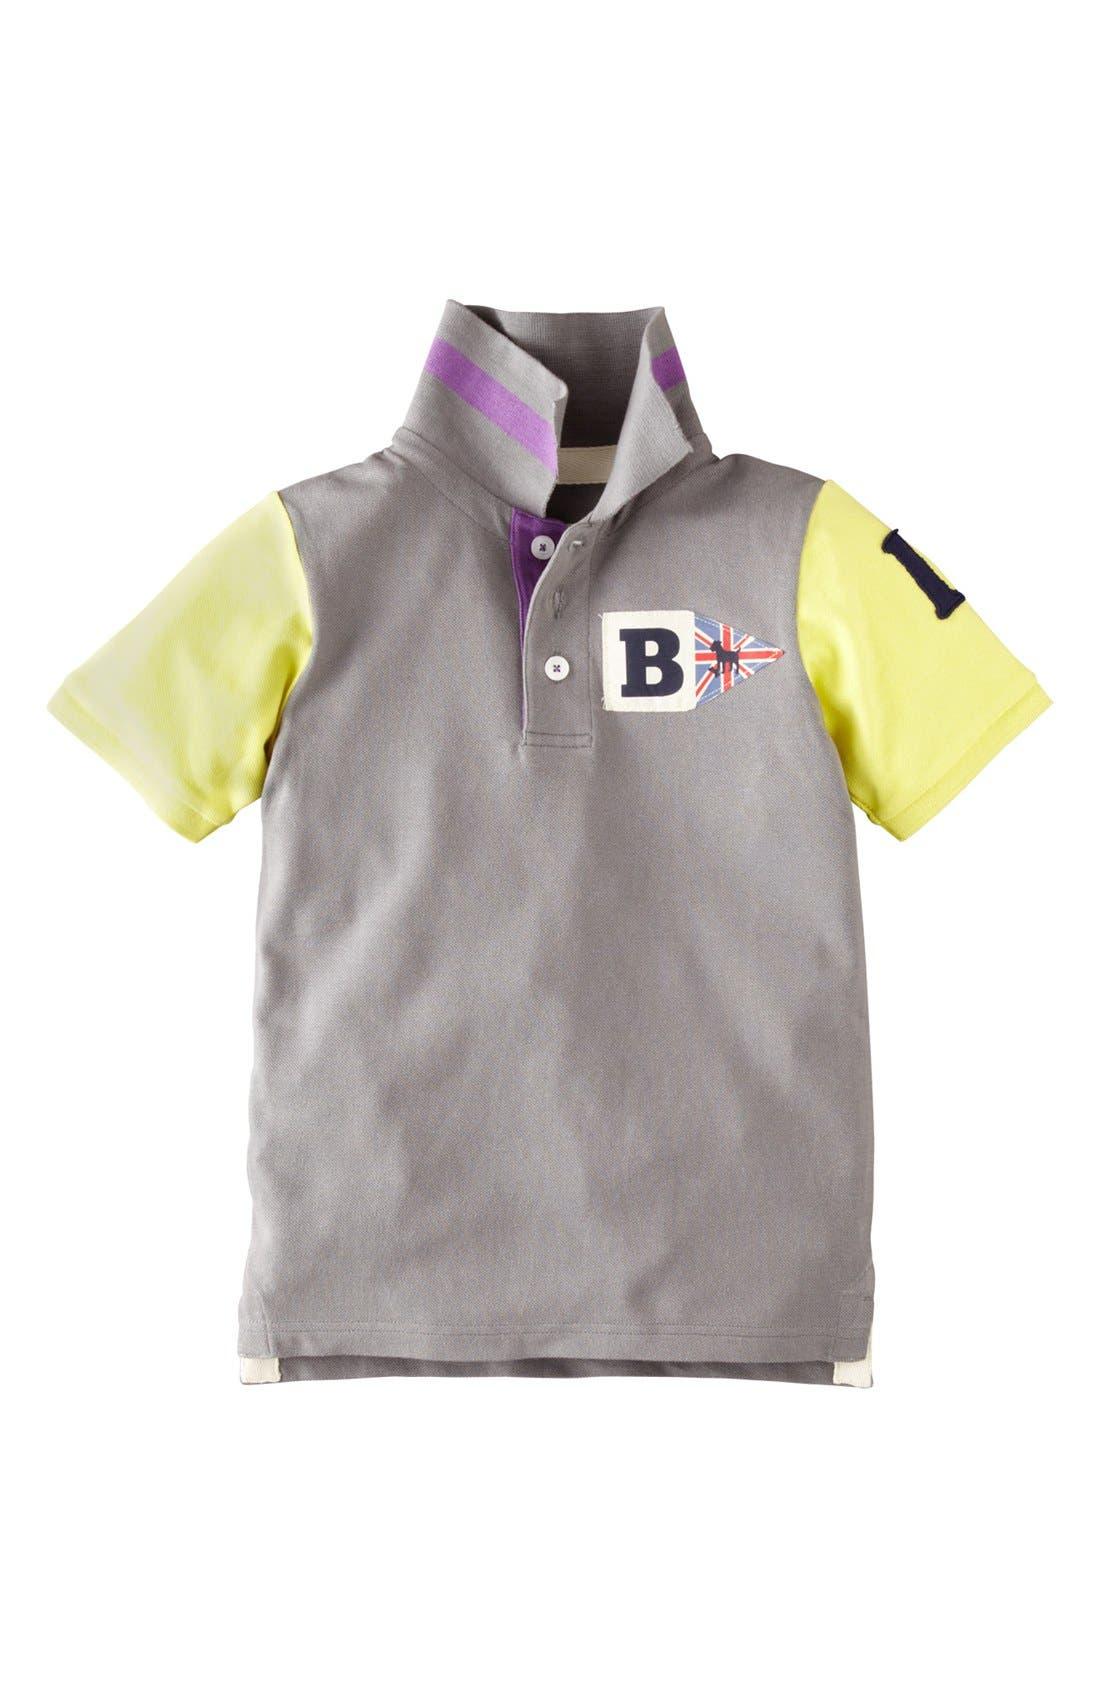 Alternate Image 1 Selected - Mini Boden Colorblock Polo Shirt (Toddler Boys, Little Boys & Big Boys)